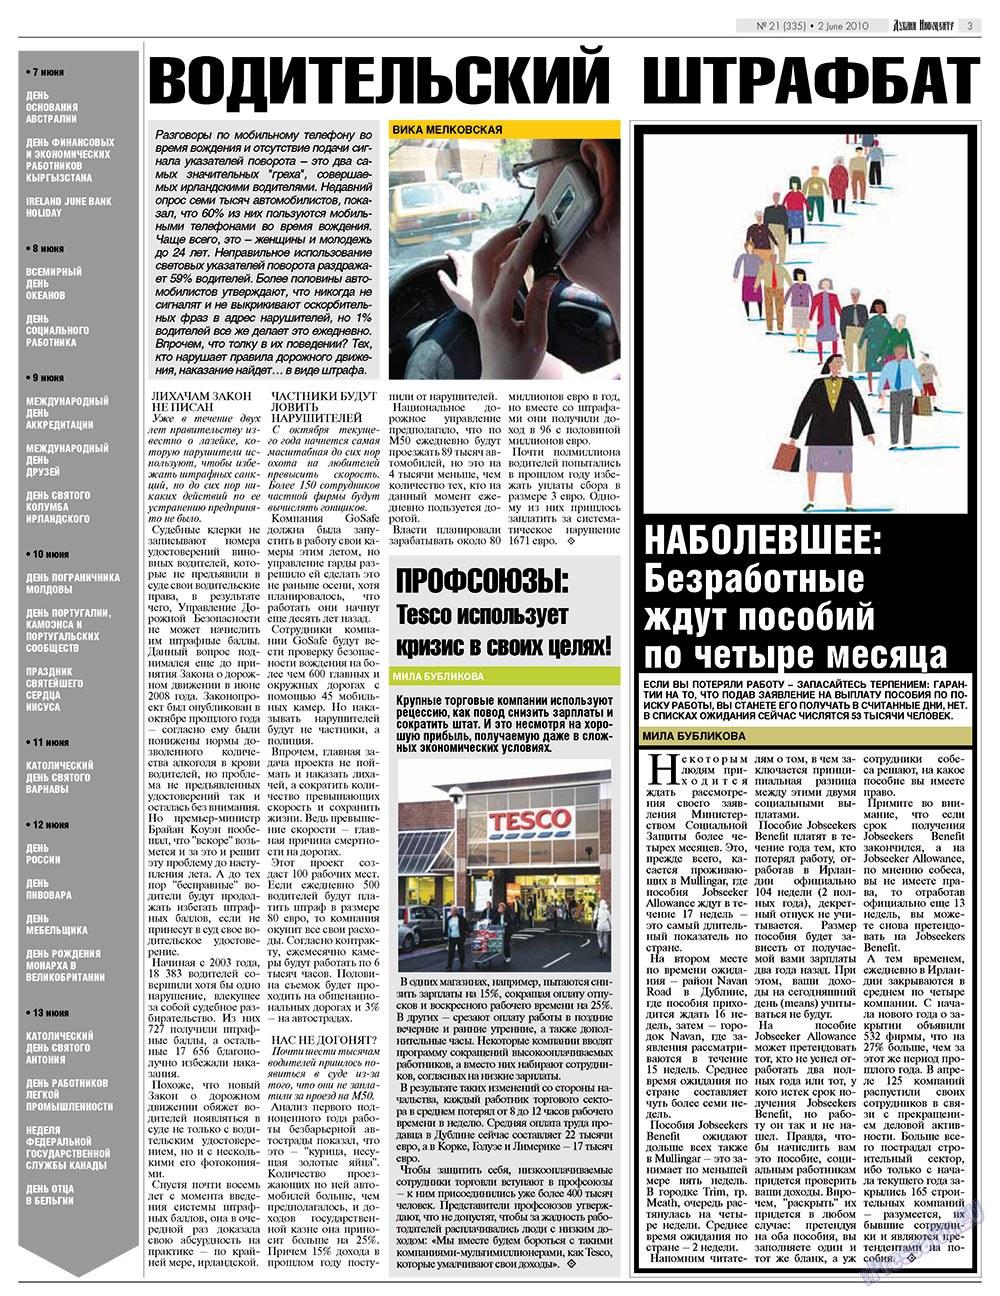 Дублин инфоцентр (газета). 2010 год, номер 21, стр. 3